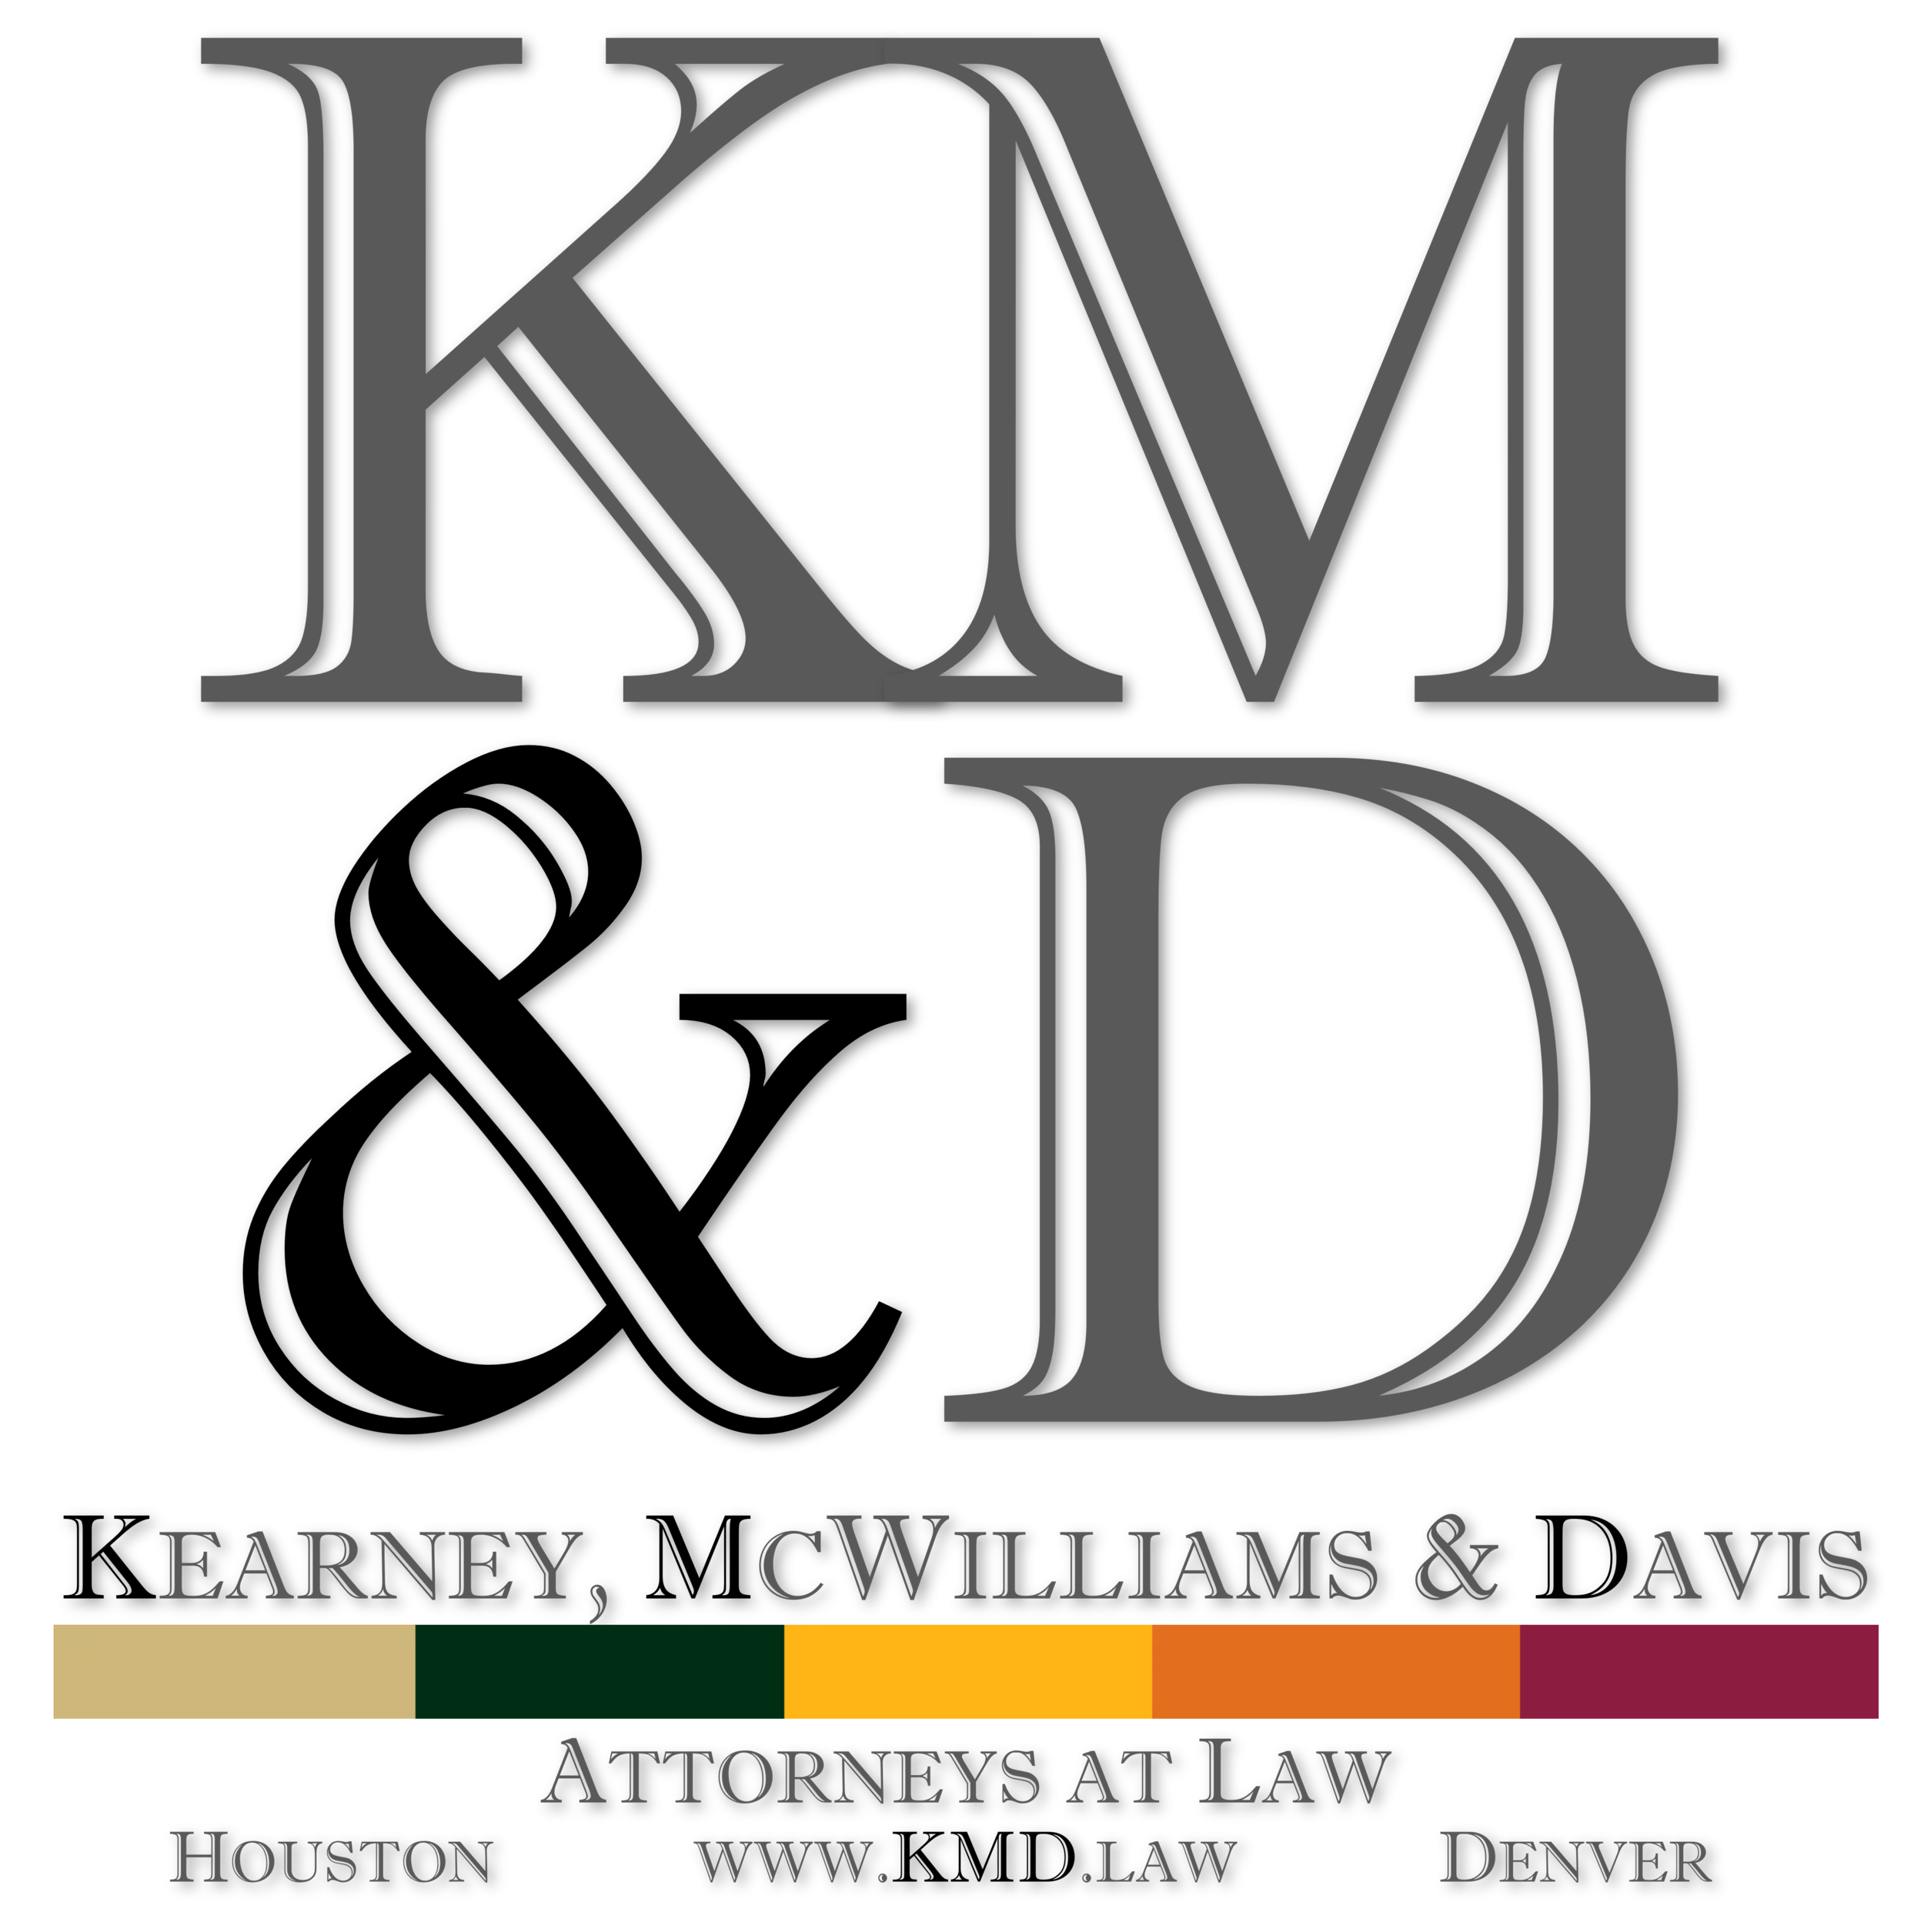 Kearney, McWilliams & Davis